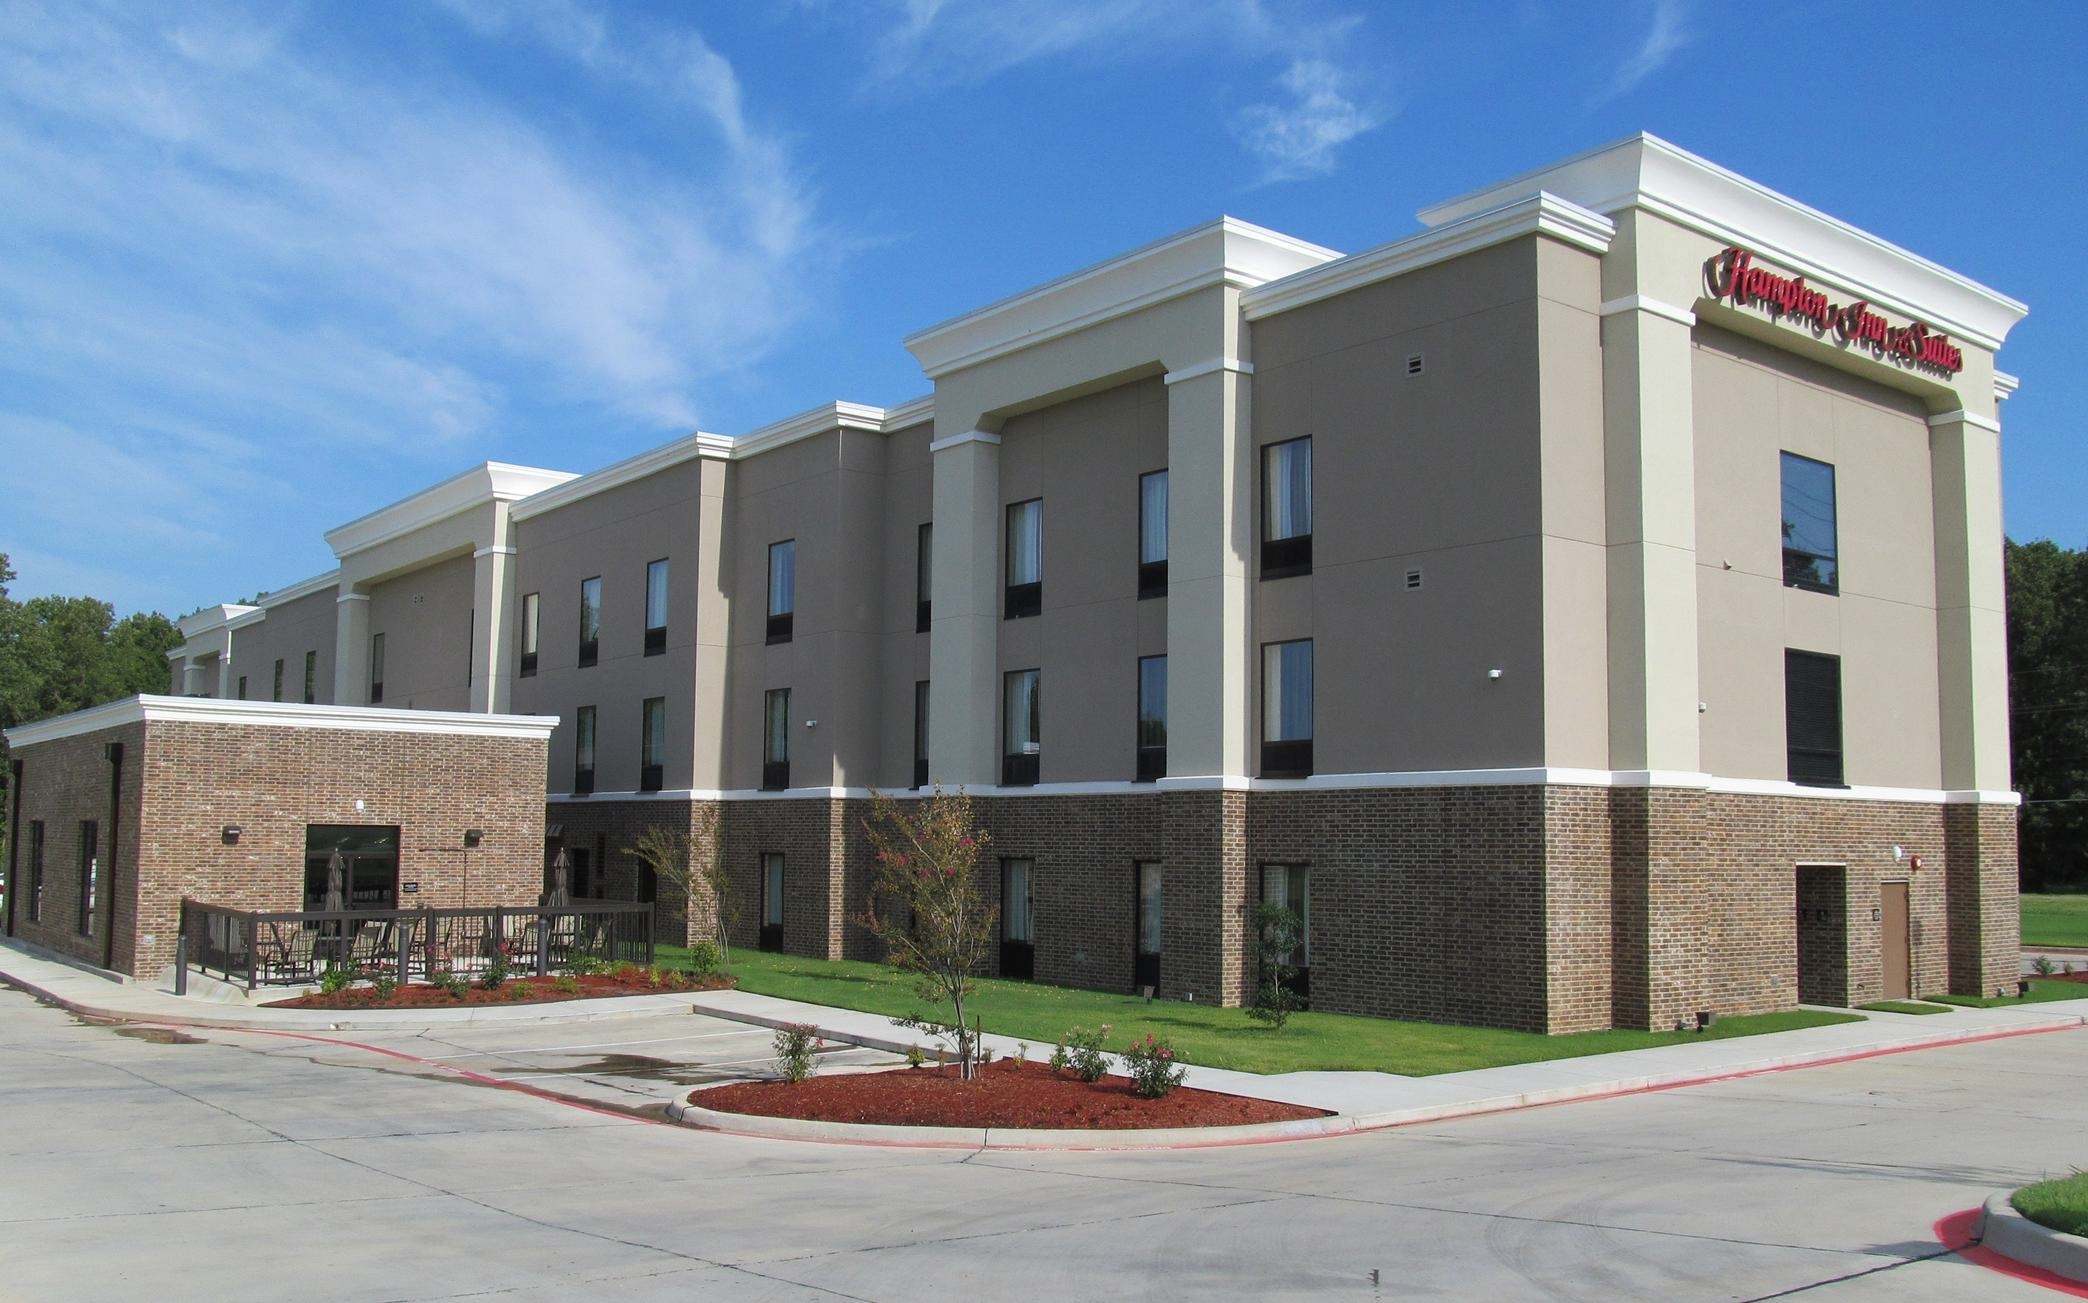 Hampton Inn & Suites Hope image 1